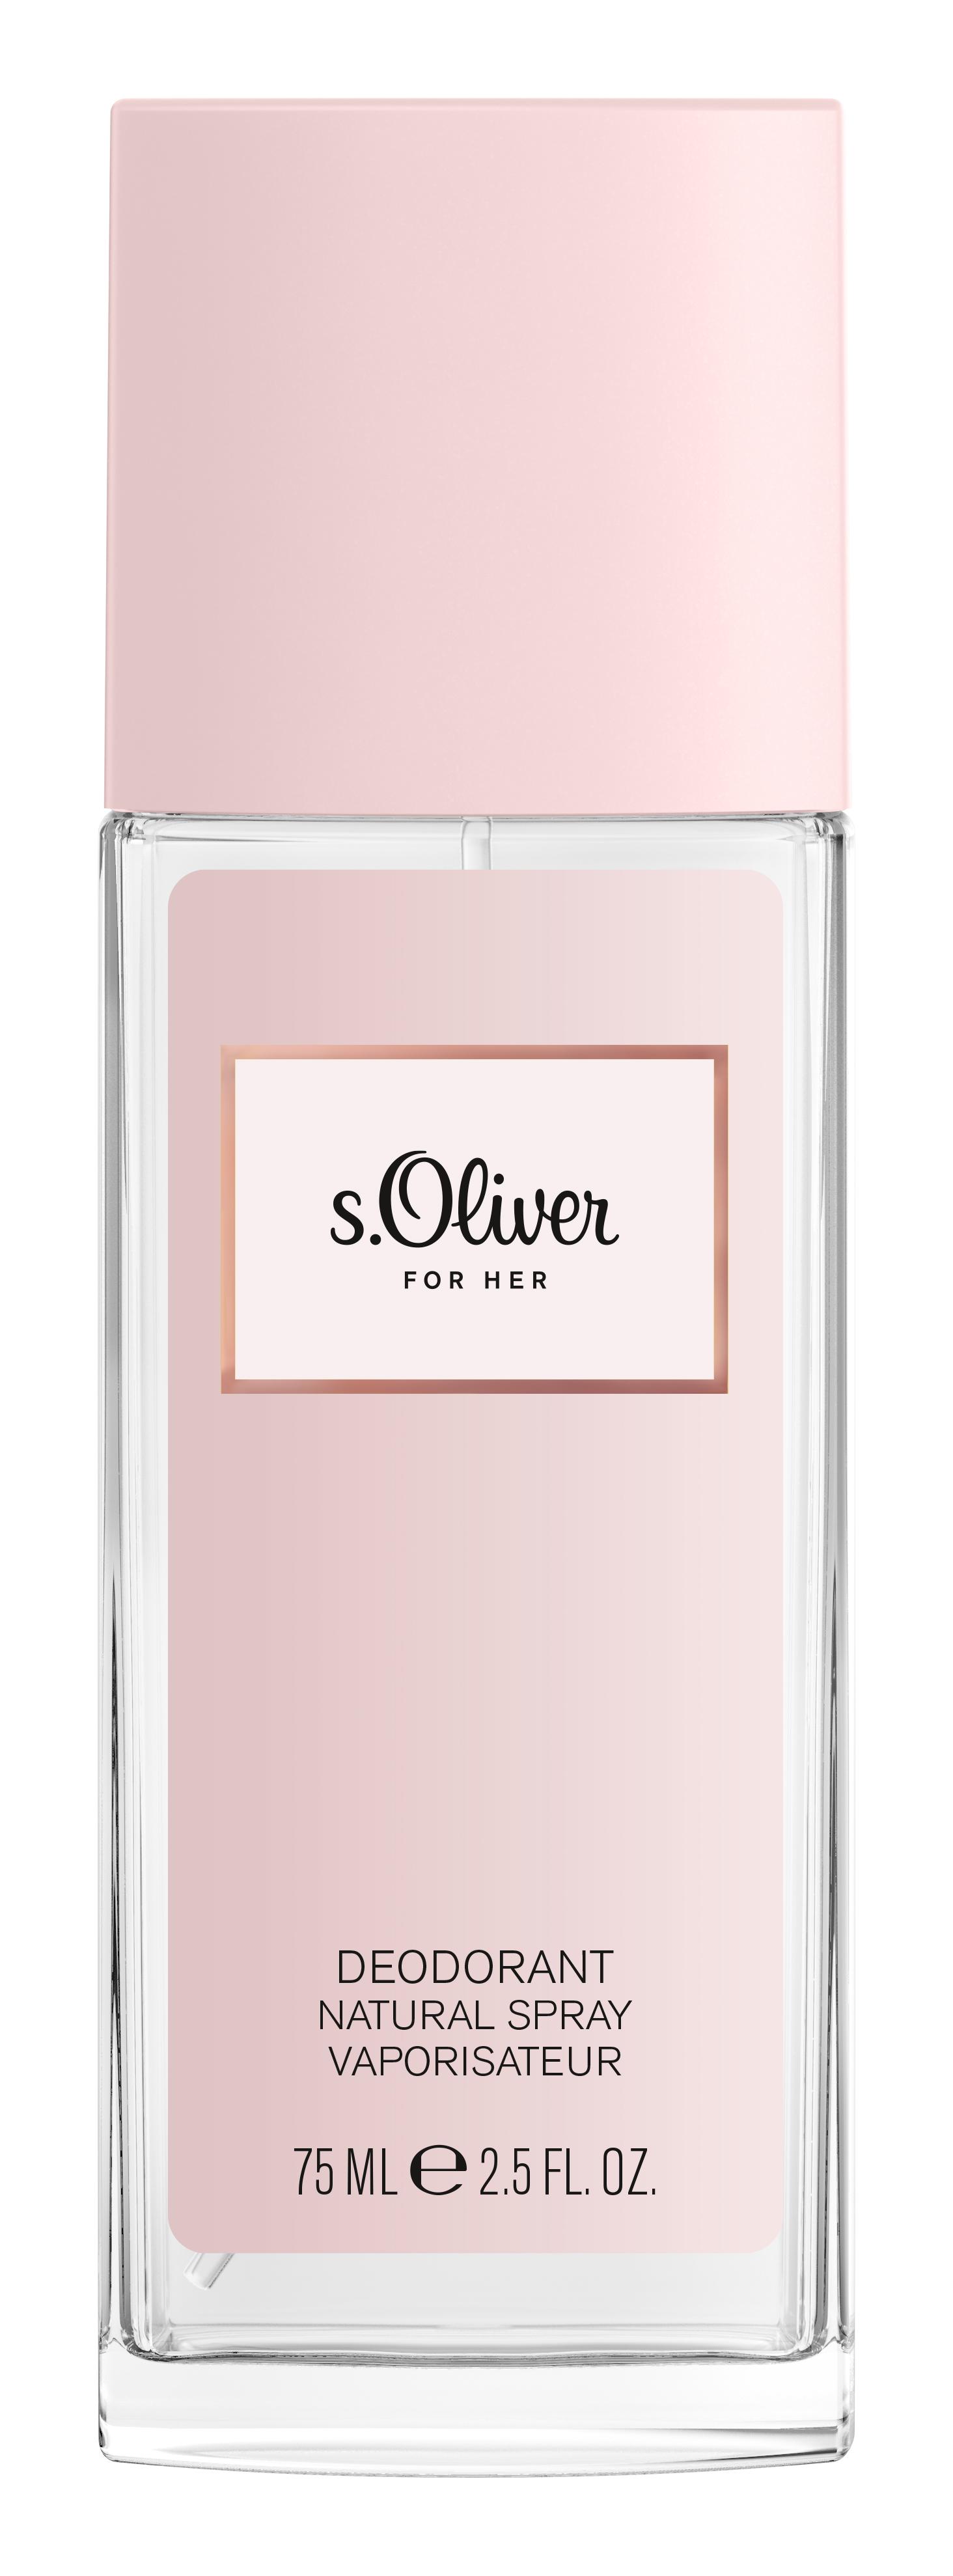 s.Oliver | s.Oliver For Her Deodorant Natural Spray 75ml